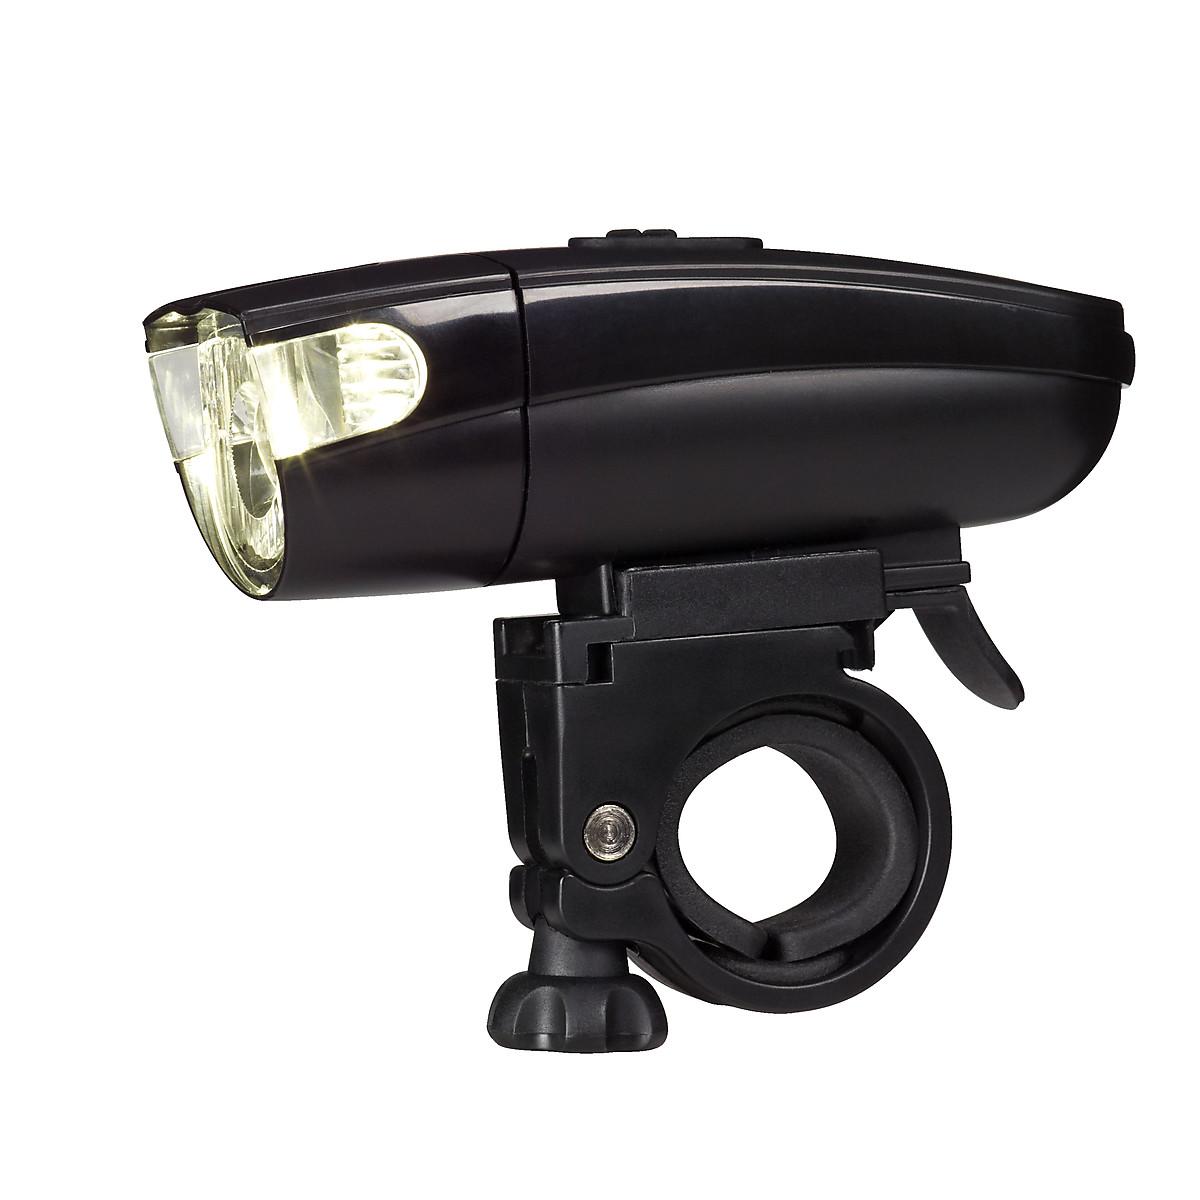 Asaklitt LED sykkelbelysning